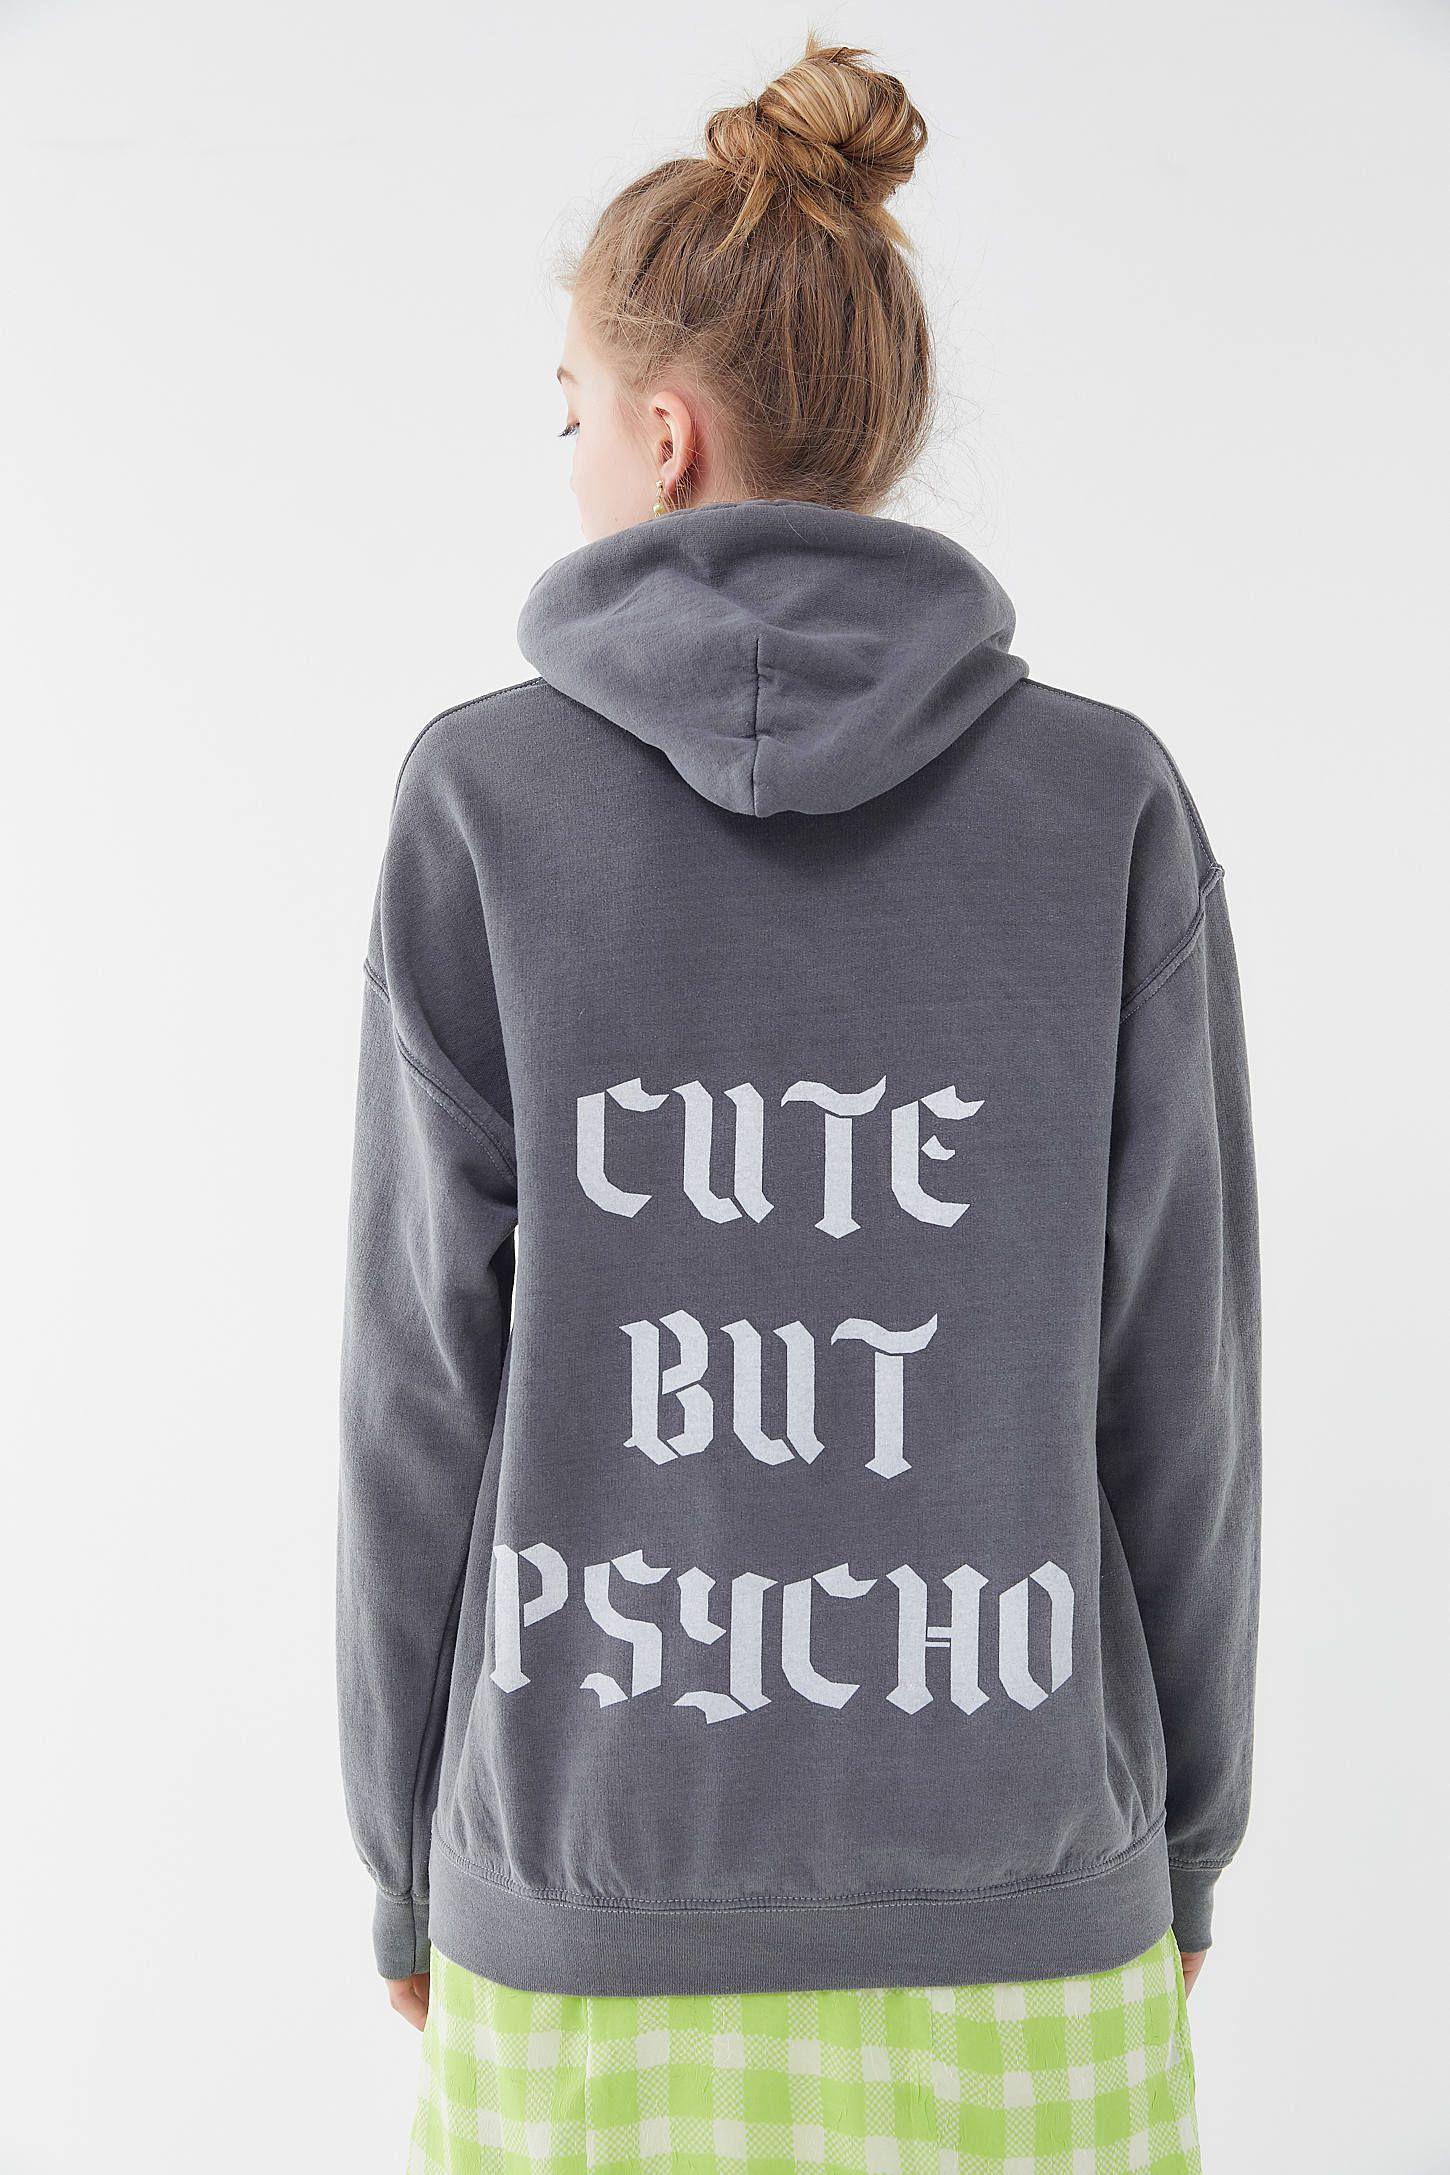 Project Social T Cute But Hoodie Sweatshirt Urban Outfitters Sweatshirts Hoodie Hoodies Sweatshirts [ 2175 x 1450 Pixel ]